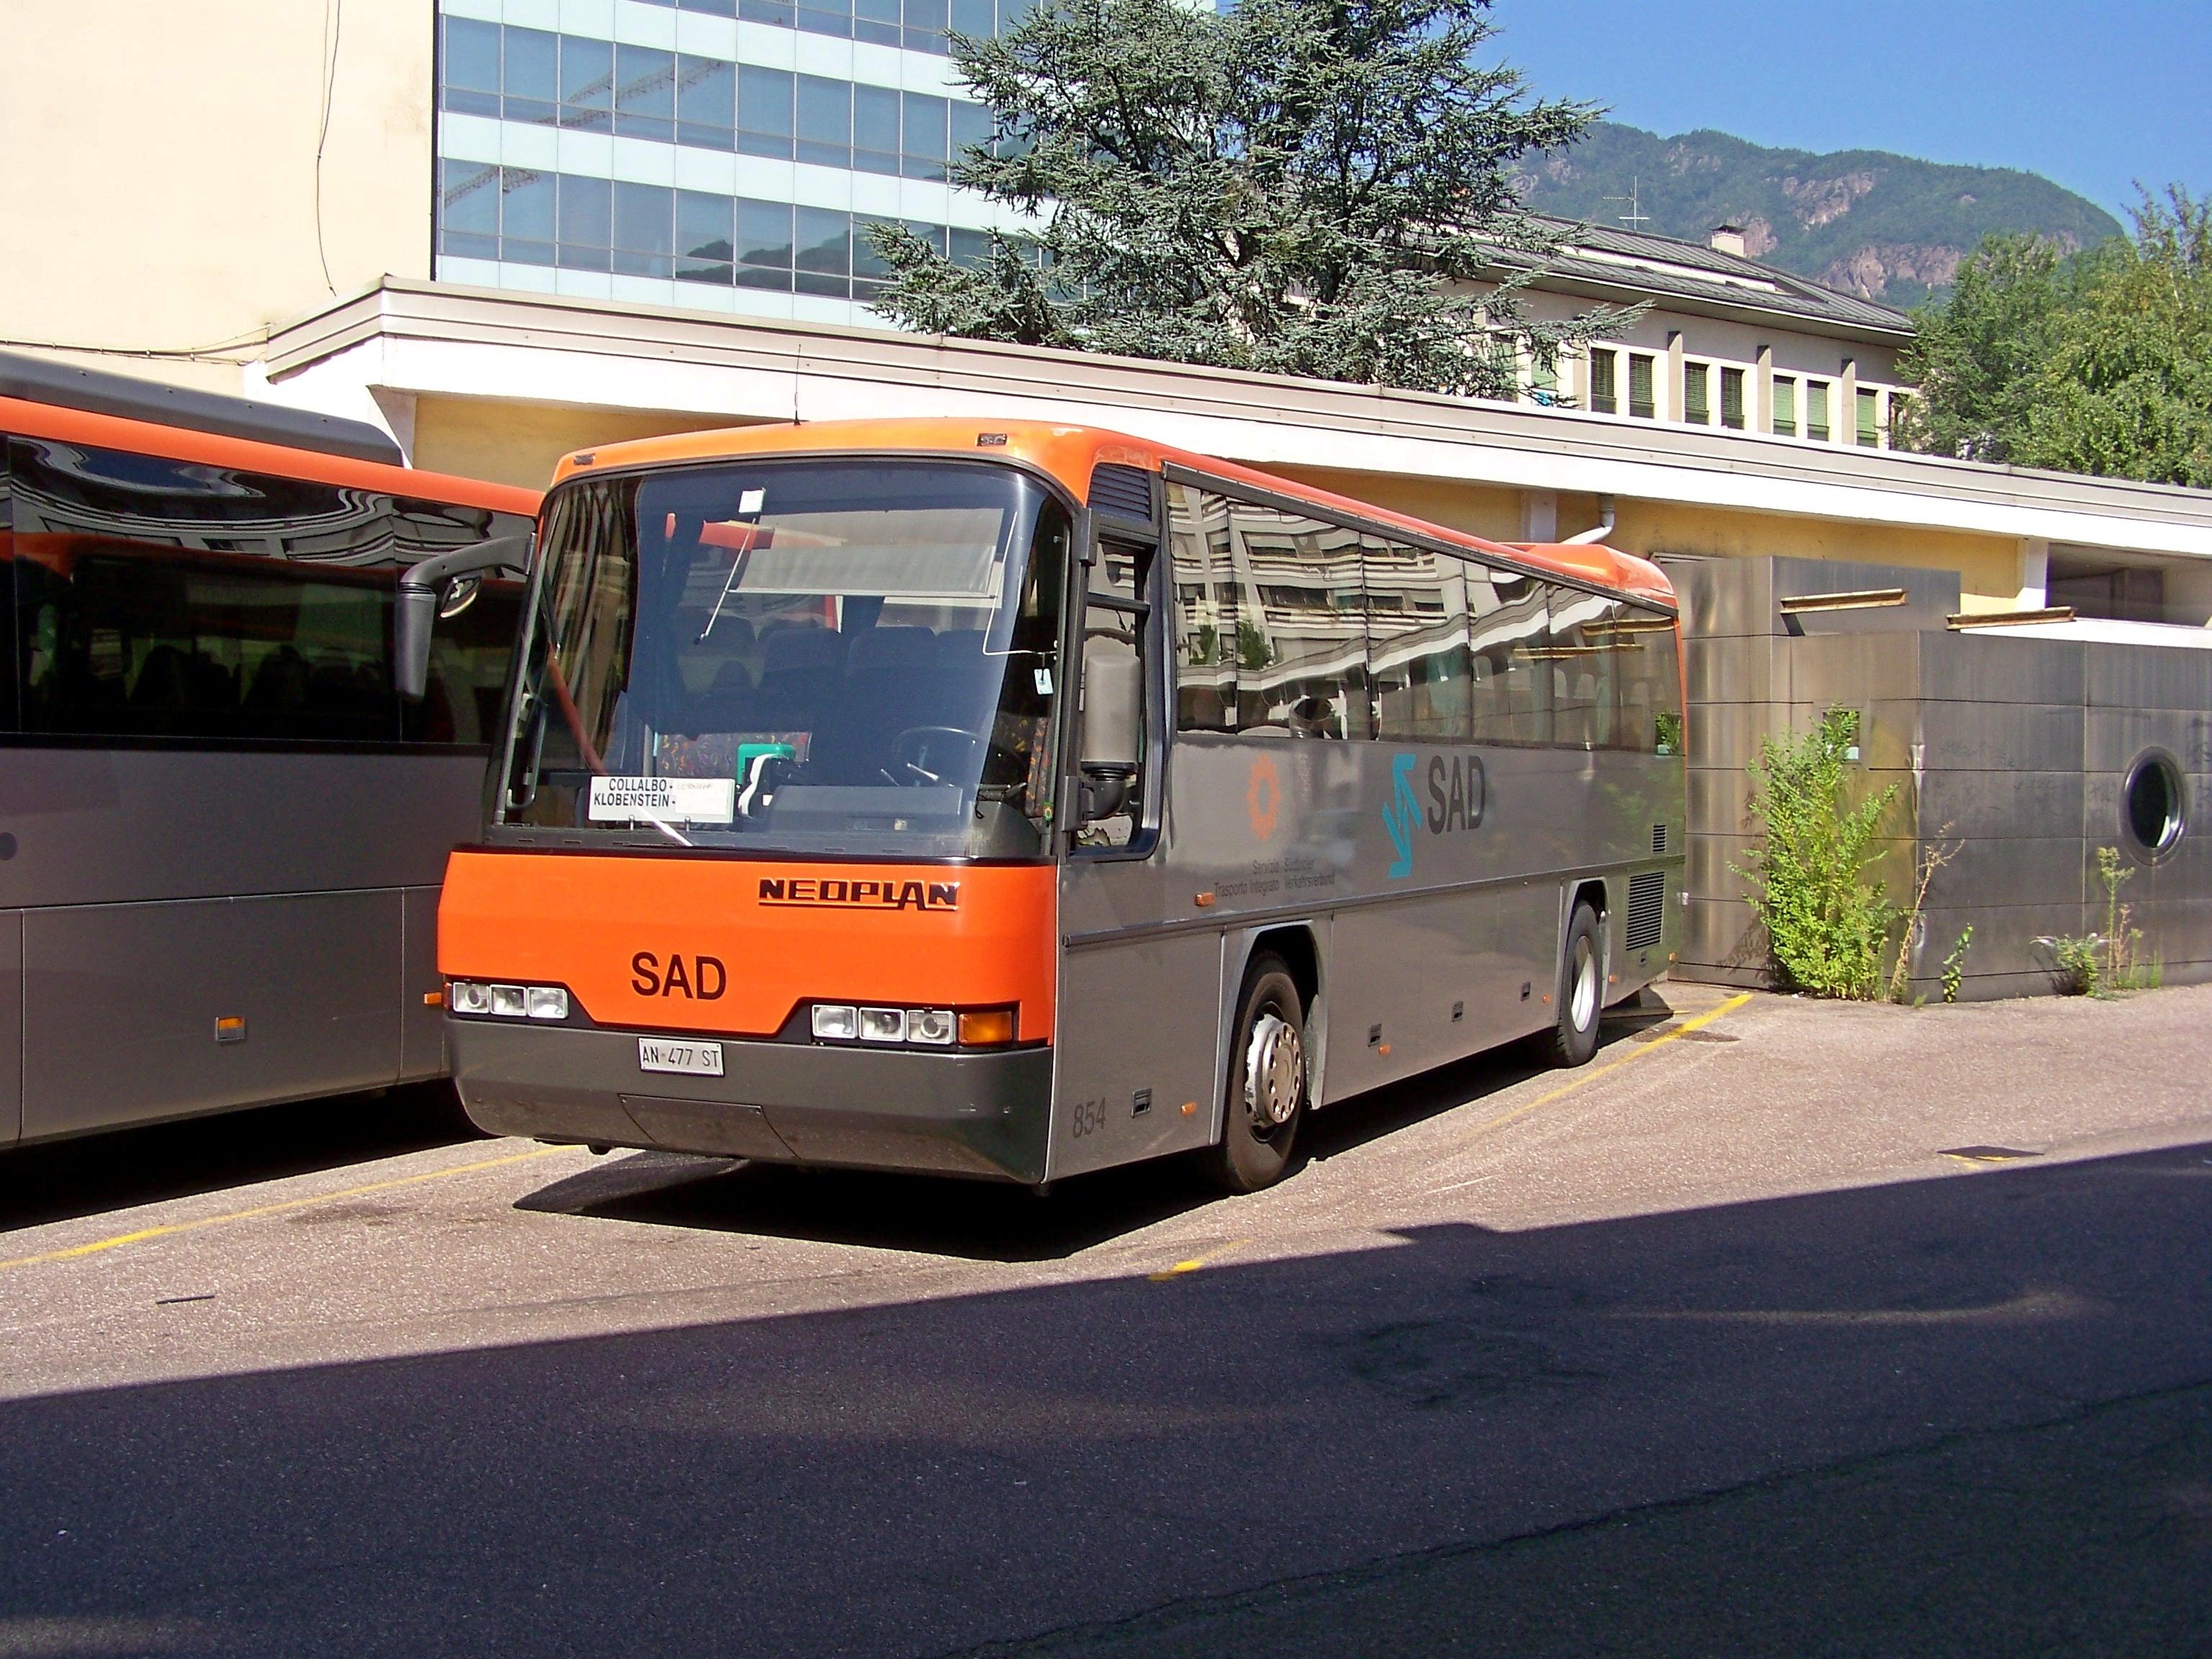 File:Neolplan N314K SAD 854 Bolzano autostazione 20110825.jpg